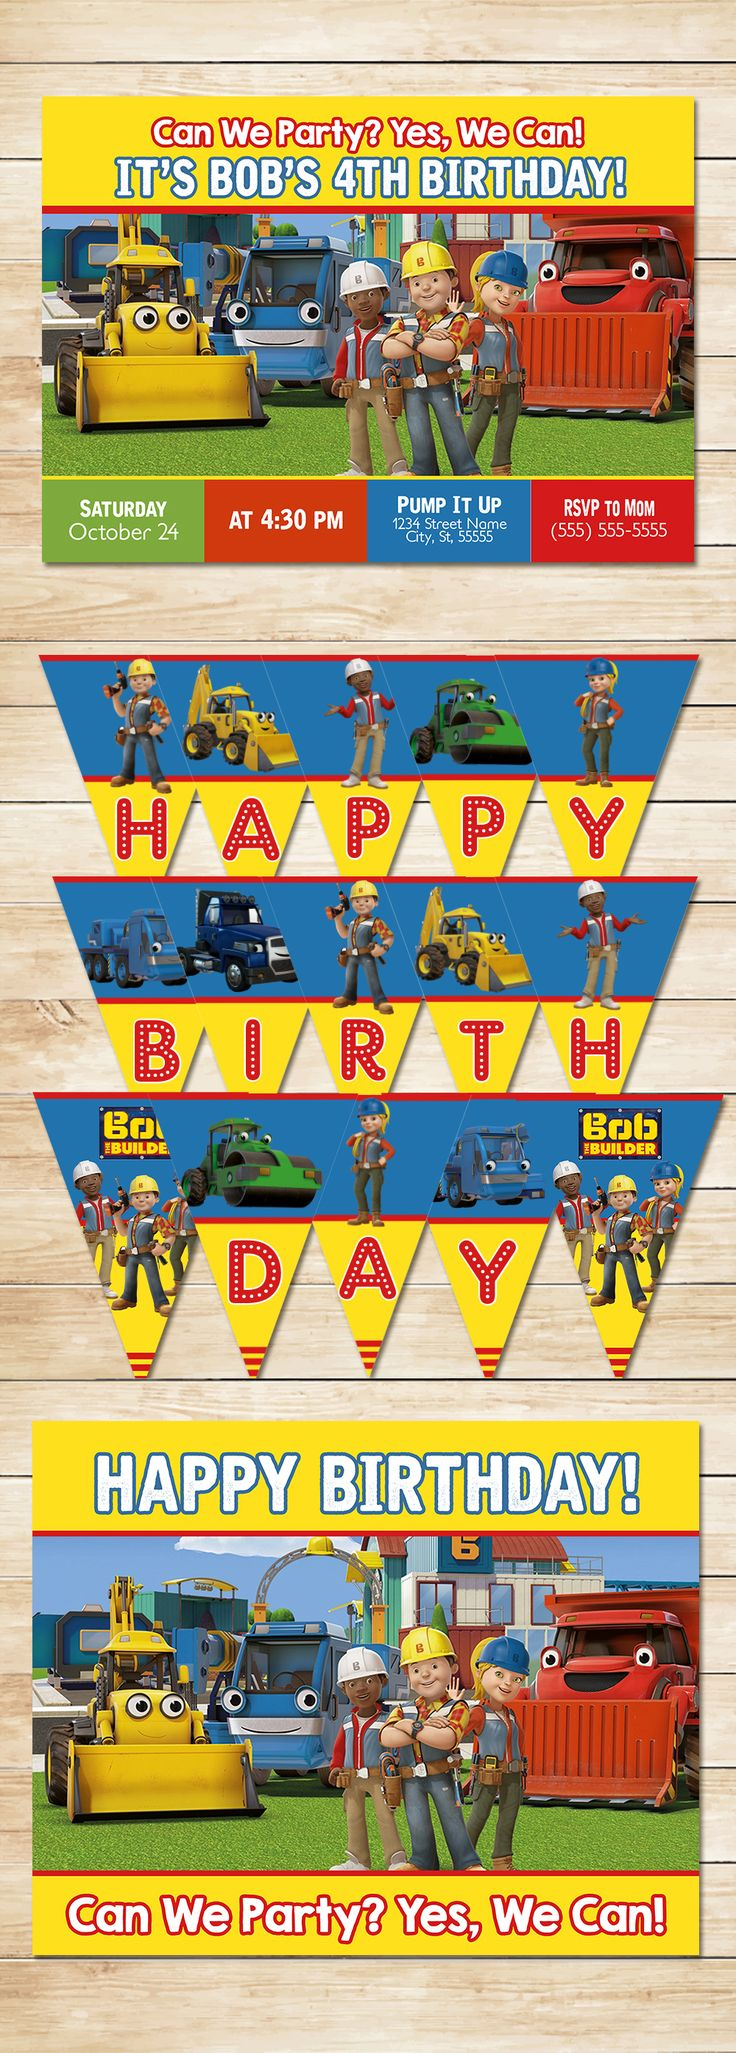 Bob the Builder Party * Bob The Builder Invitation * Bob The Builder Banner *Bob The Builder Birthday * Bob The Builder Printables